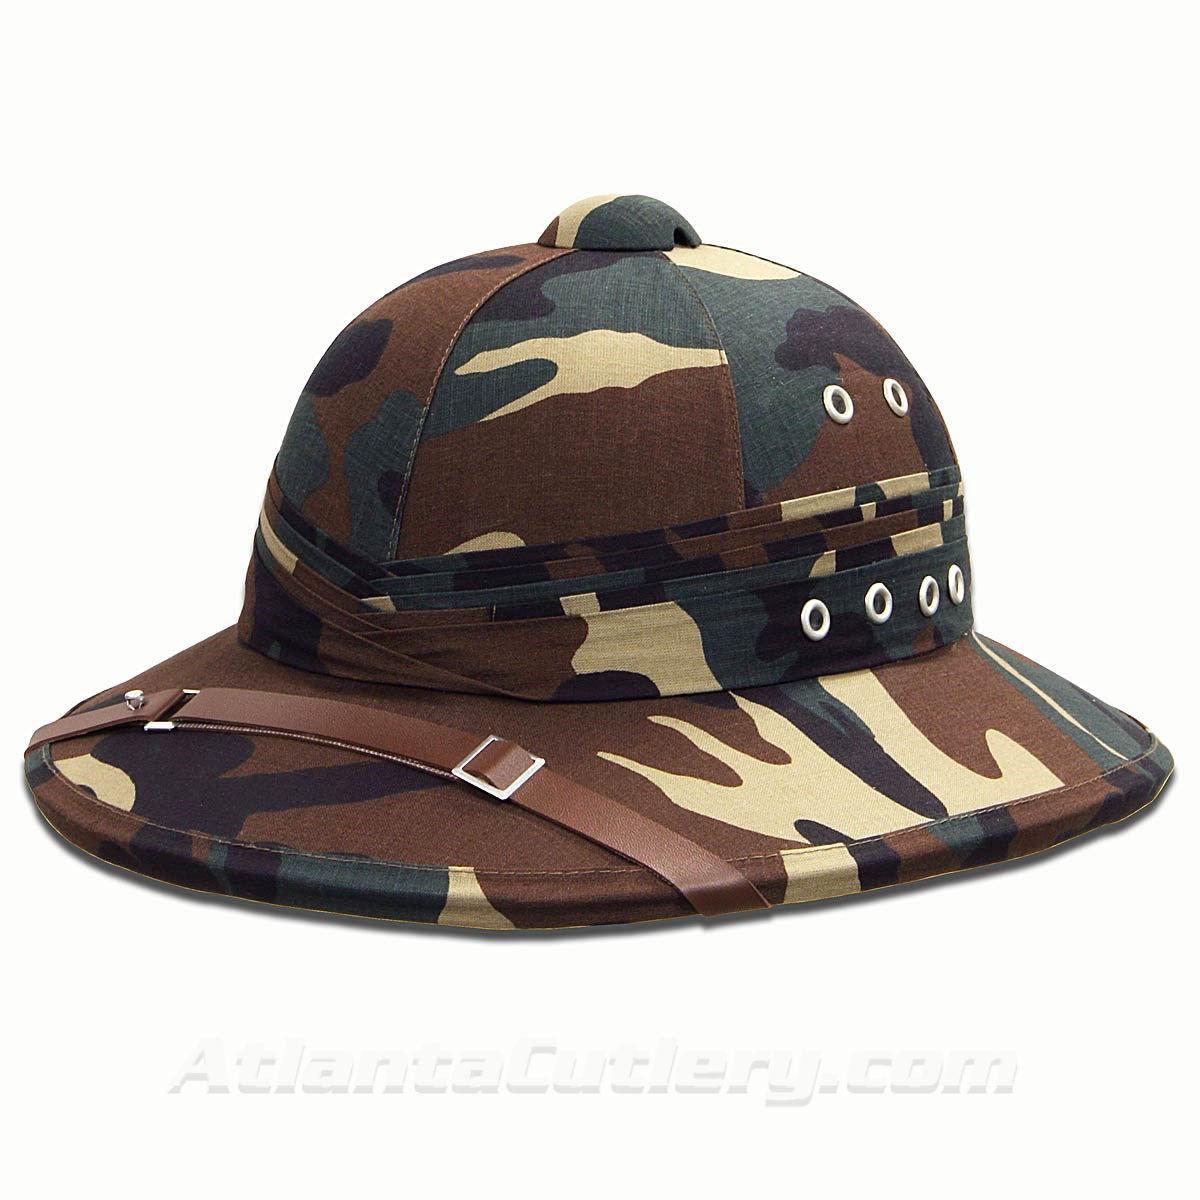 US Style Pith Helmet